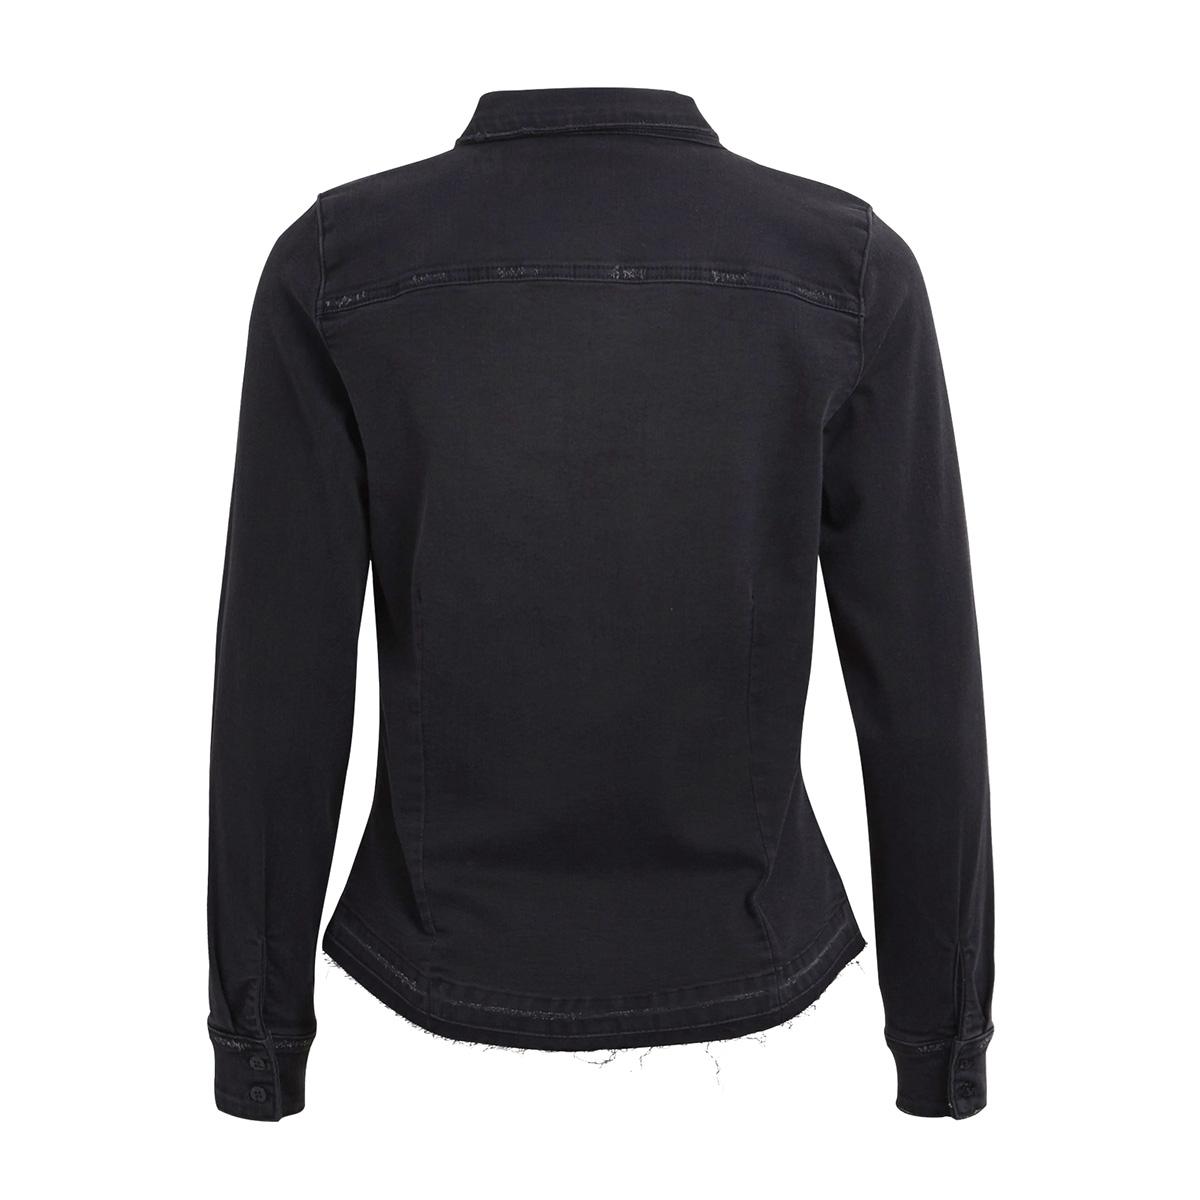 objblack bella denim shirt 93 23025672 object blouse black denim